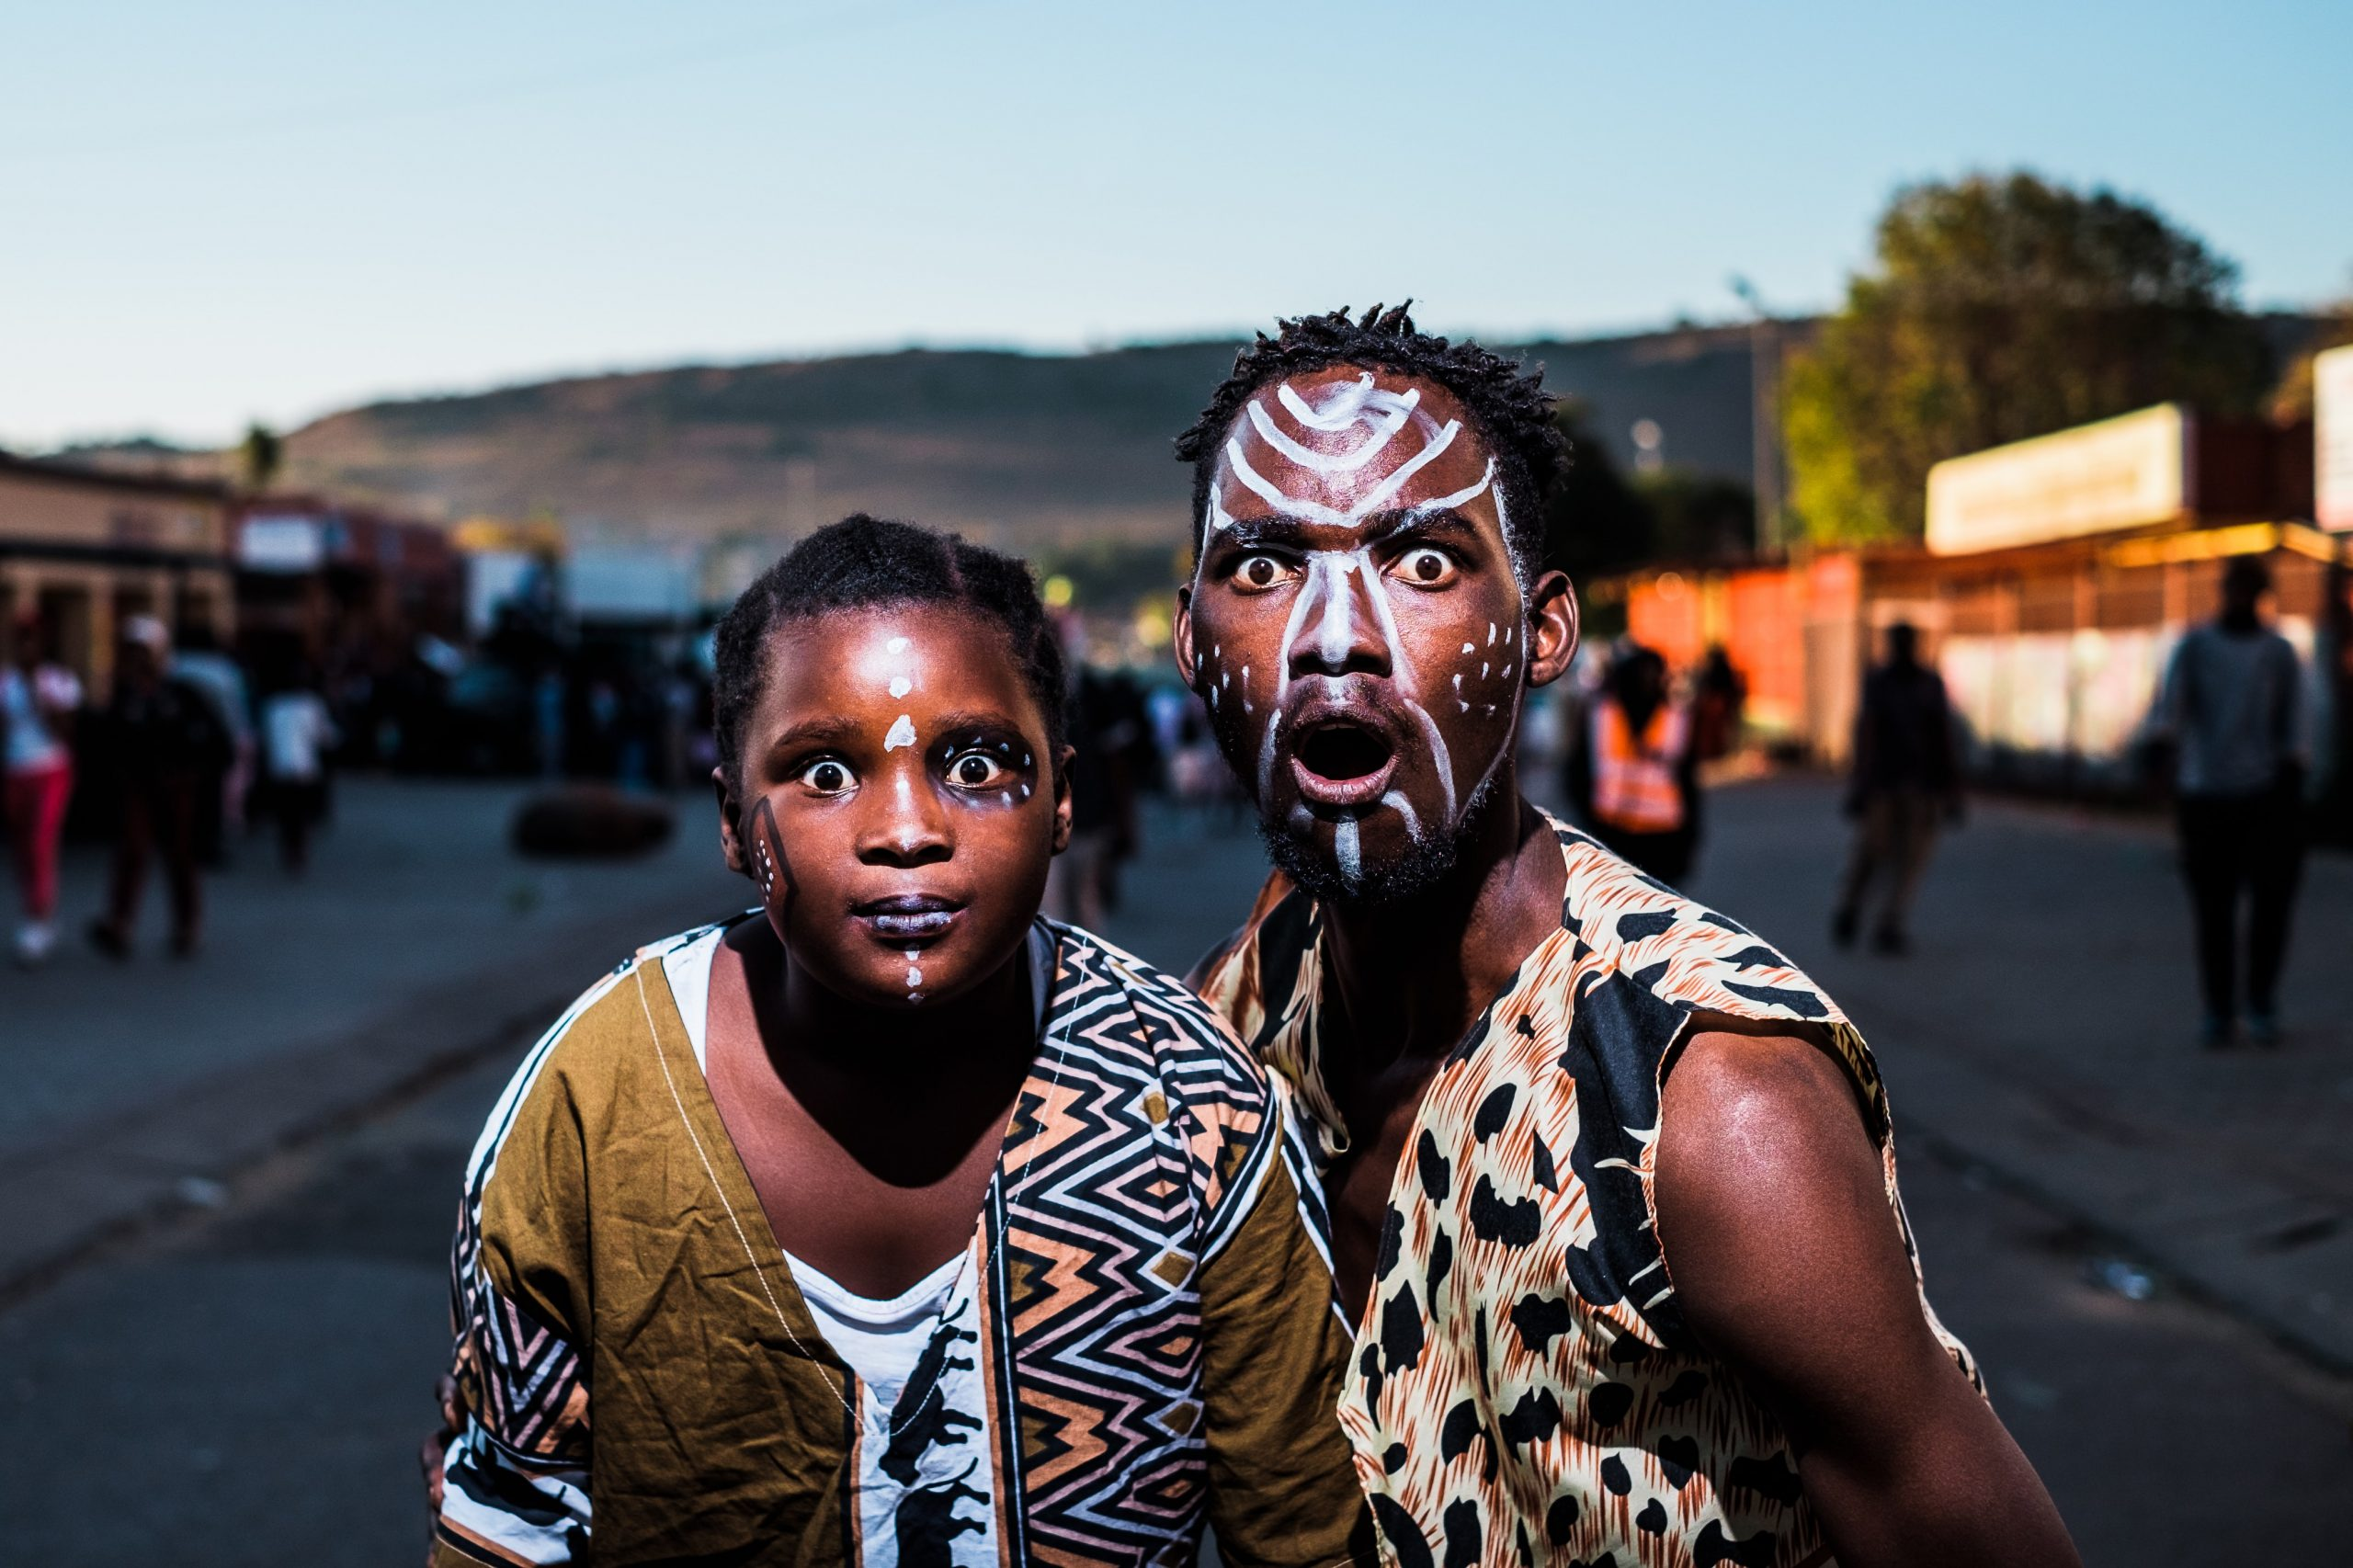 Visit South Africa culture